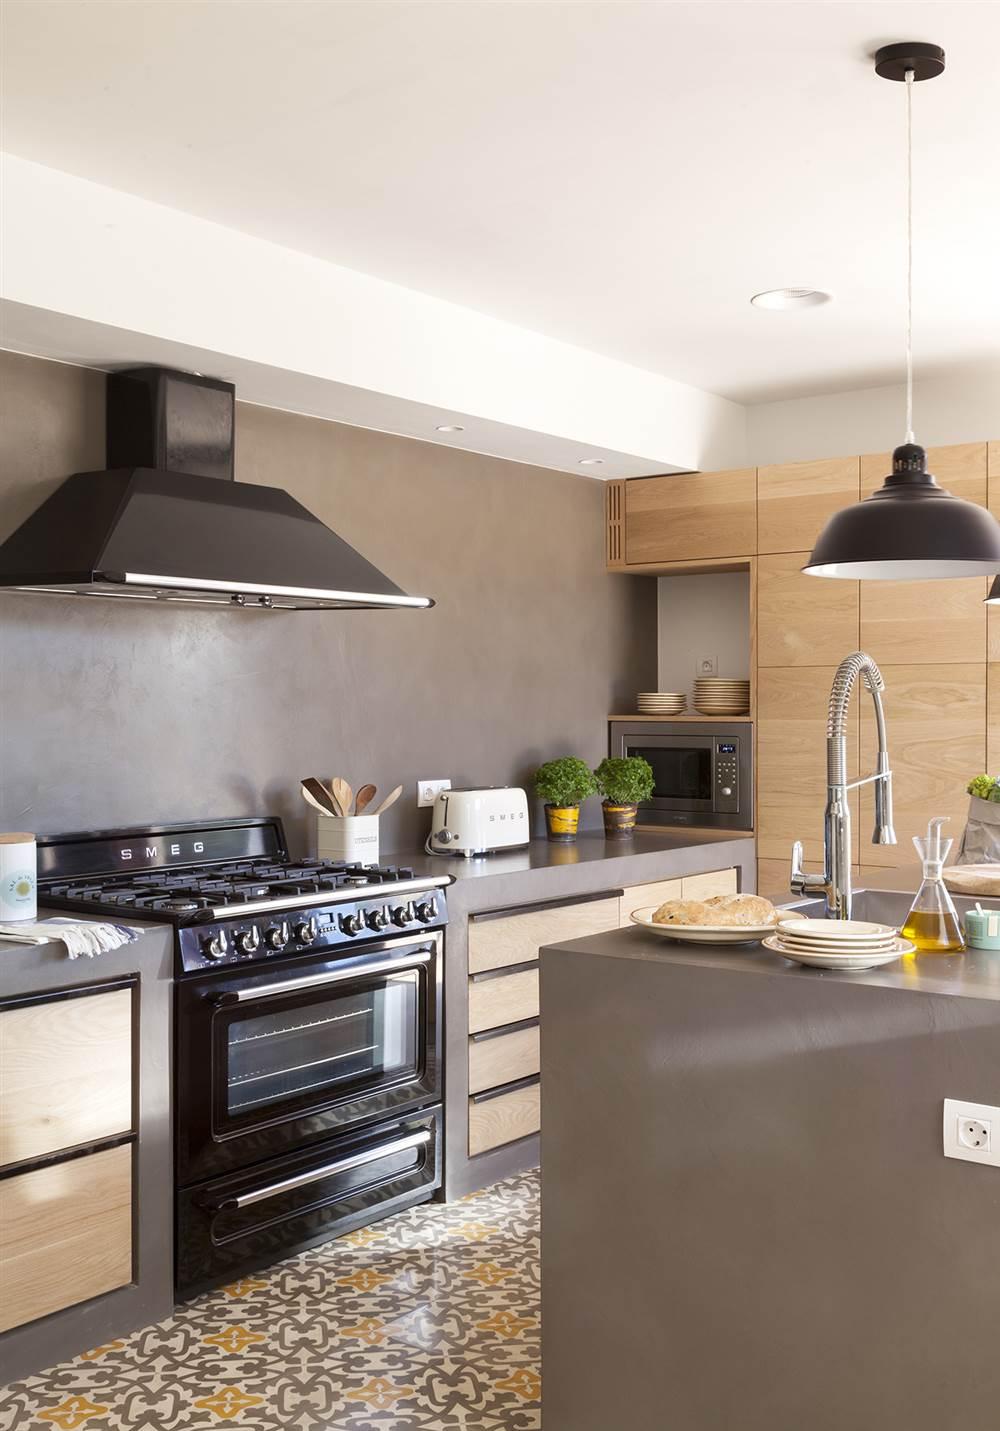 Formas De Microcemento En Cocinas Fotos De Casa Ideas